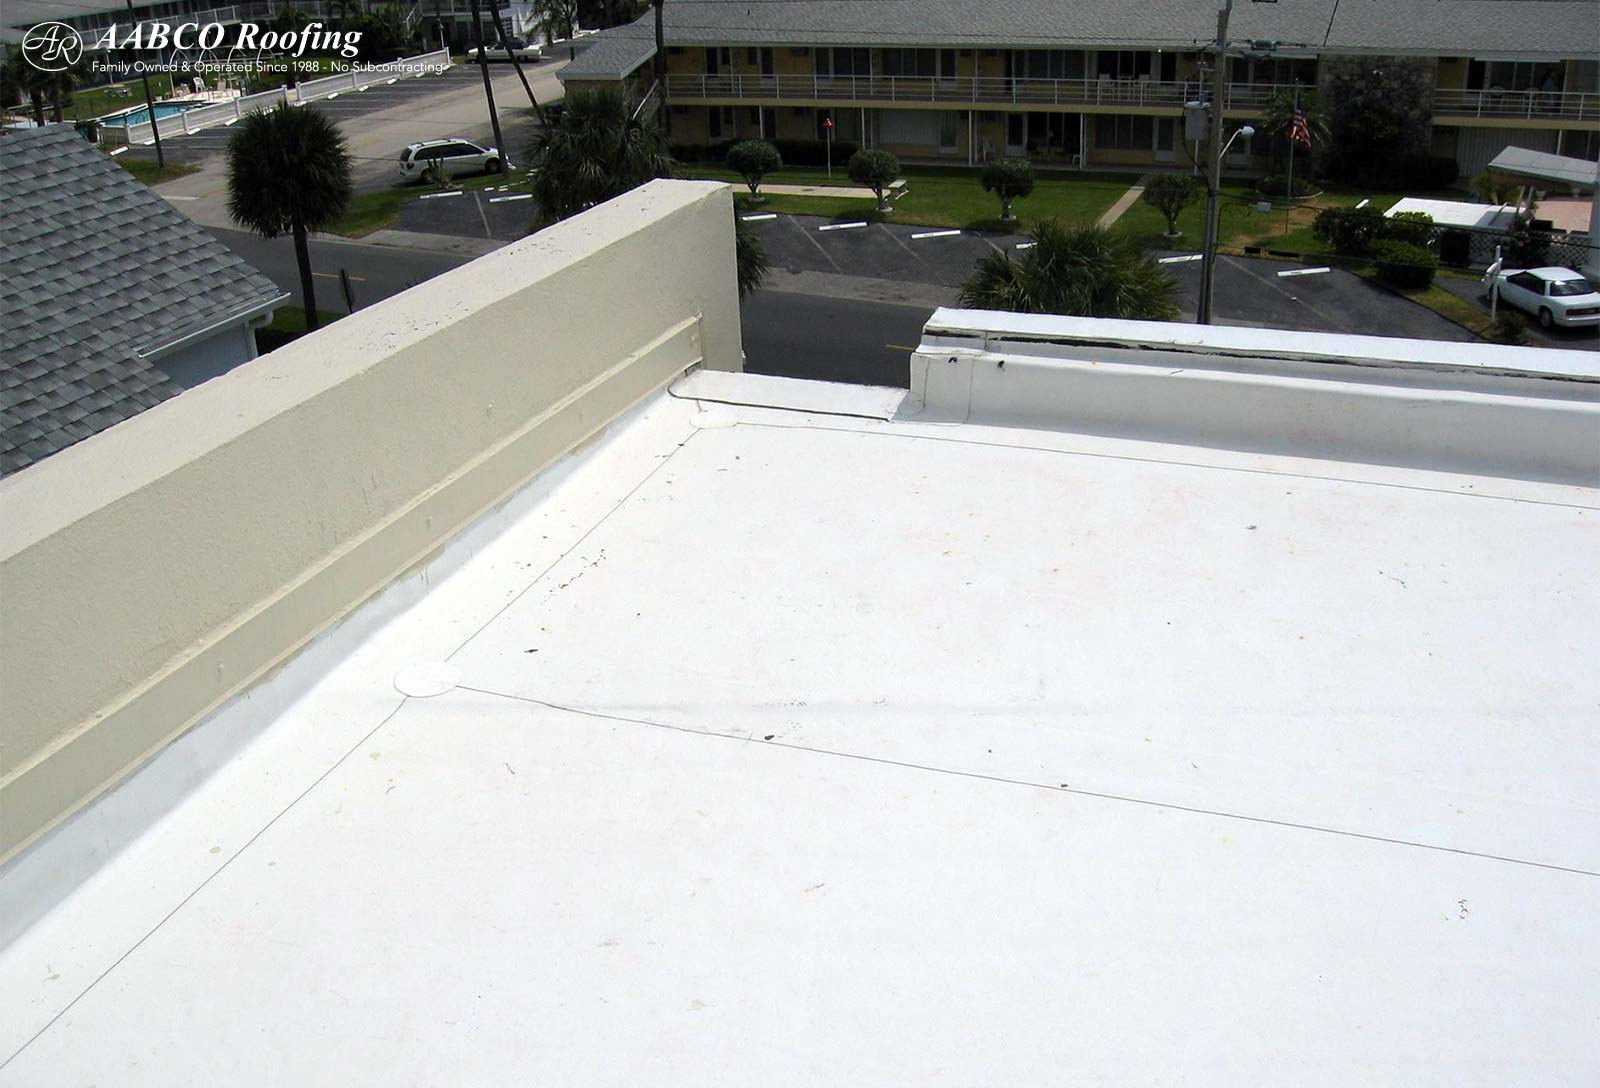 GACO silicone flat roof coating